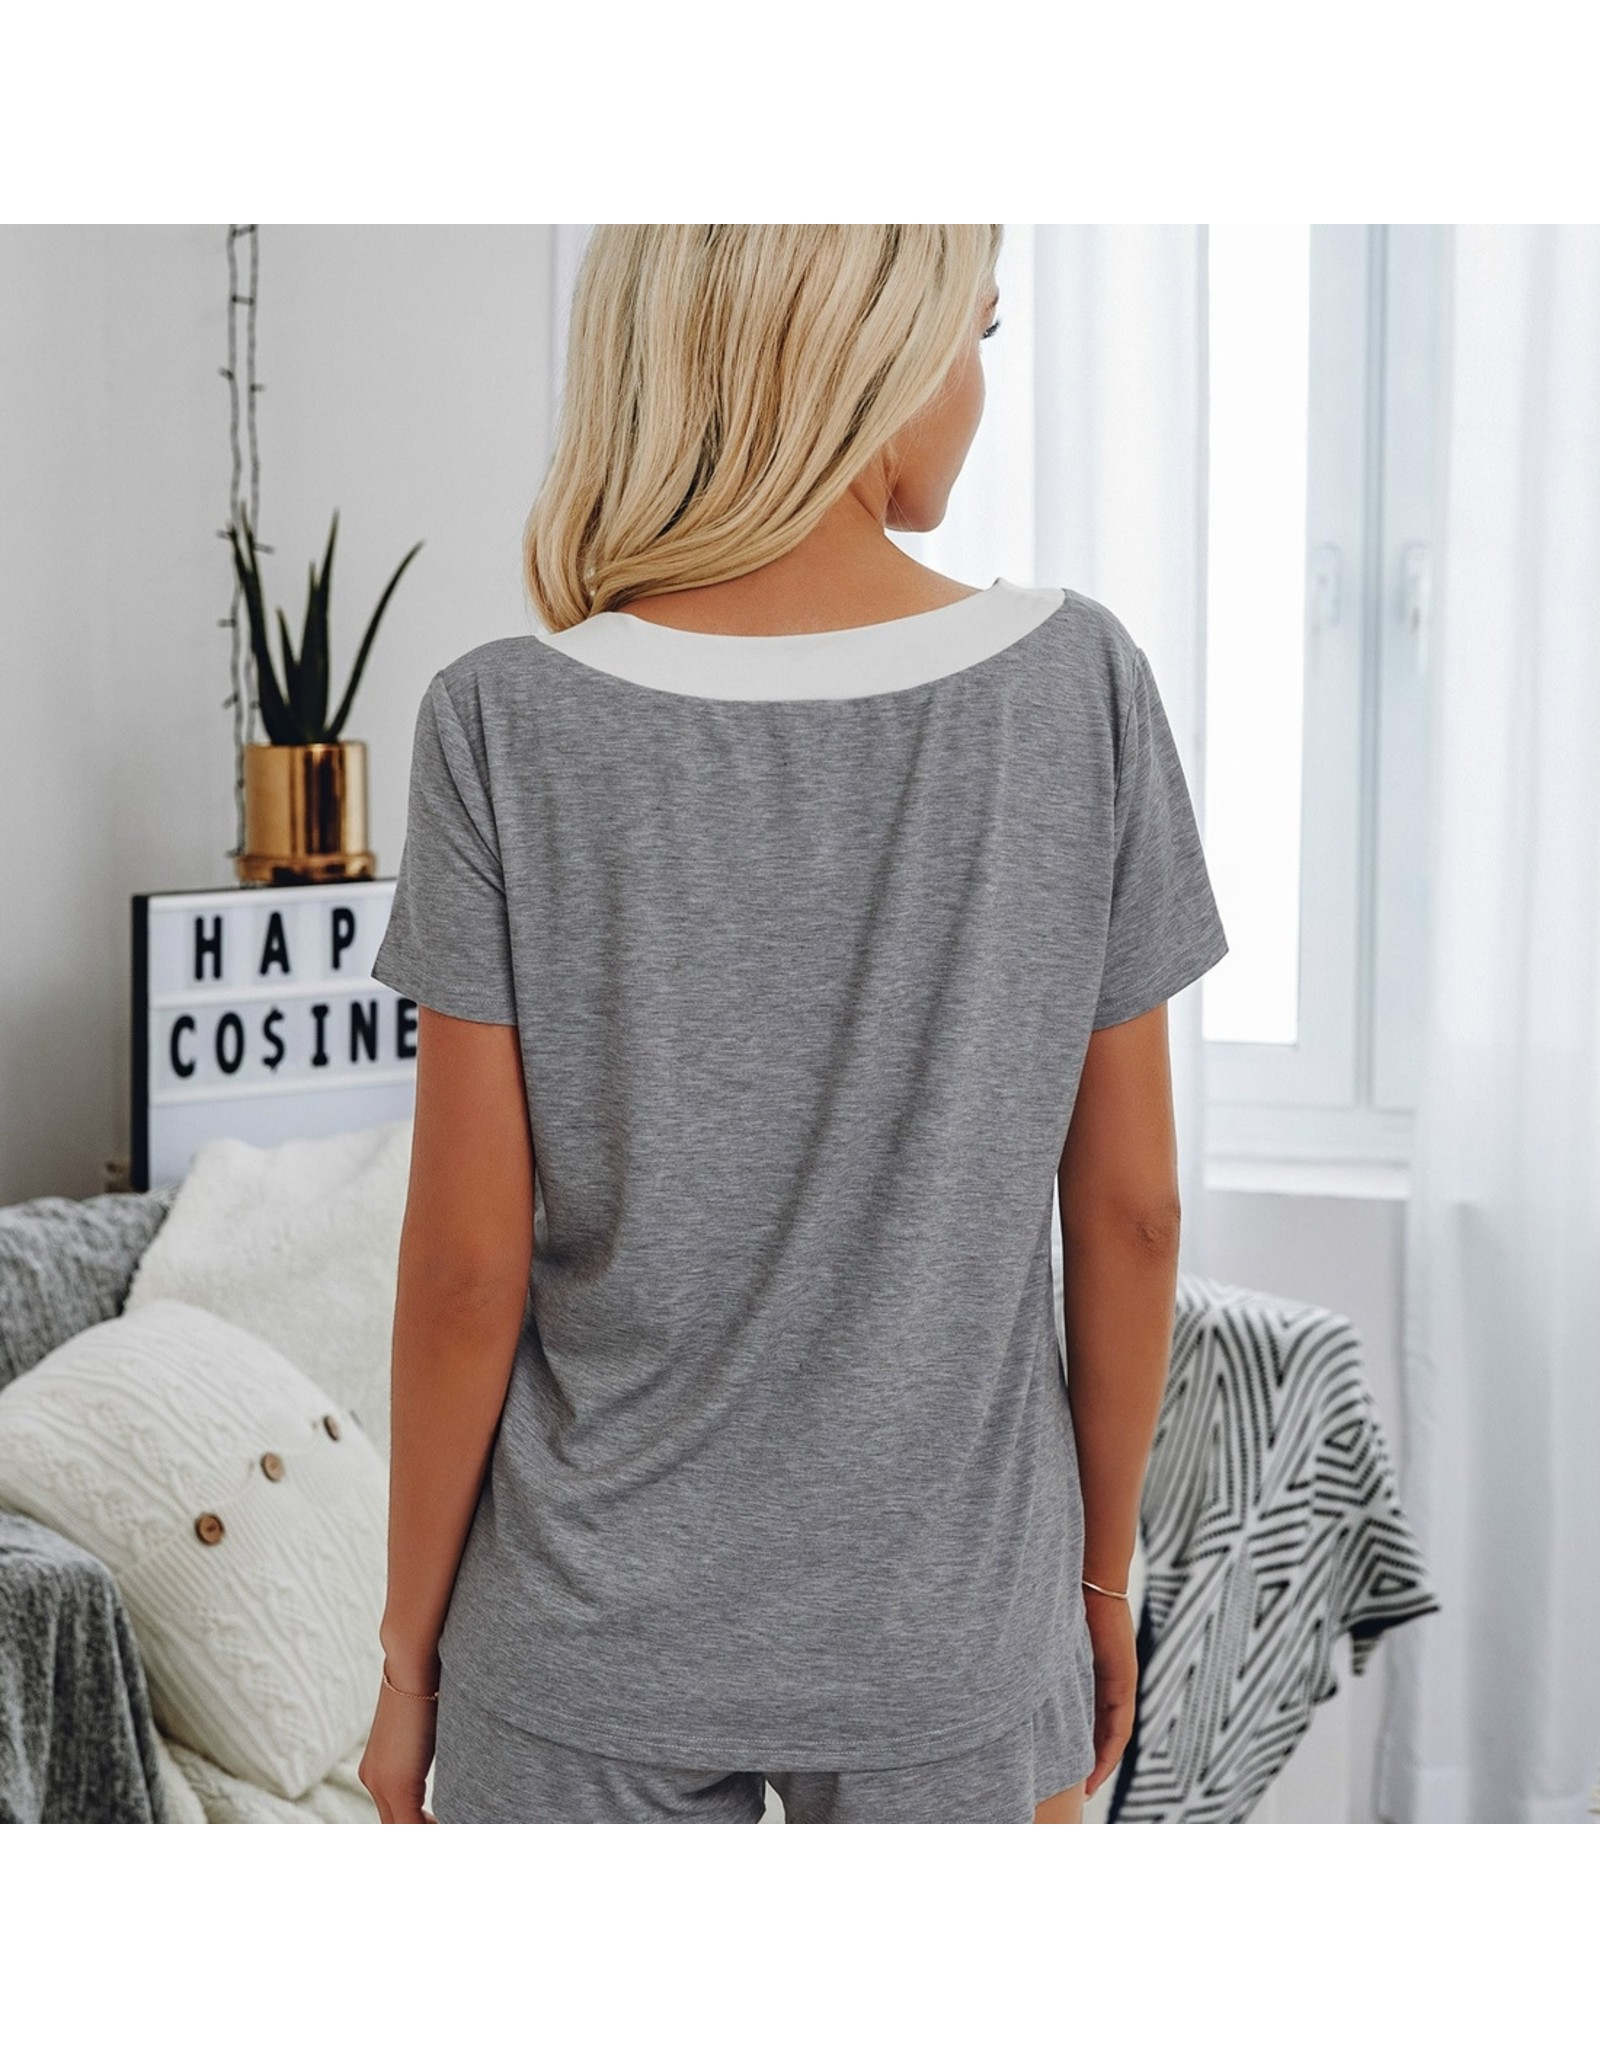 ePretty Soft V-neck Lounge Top